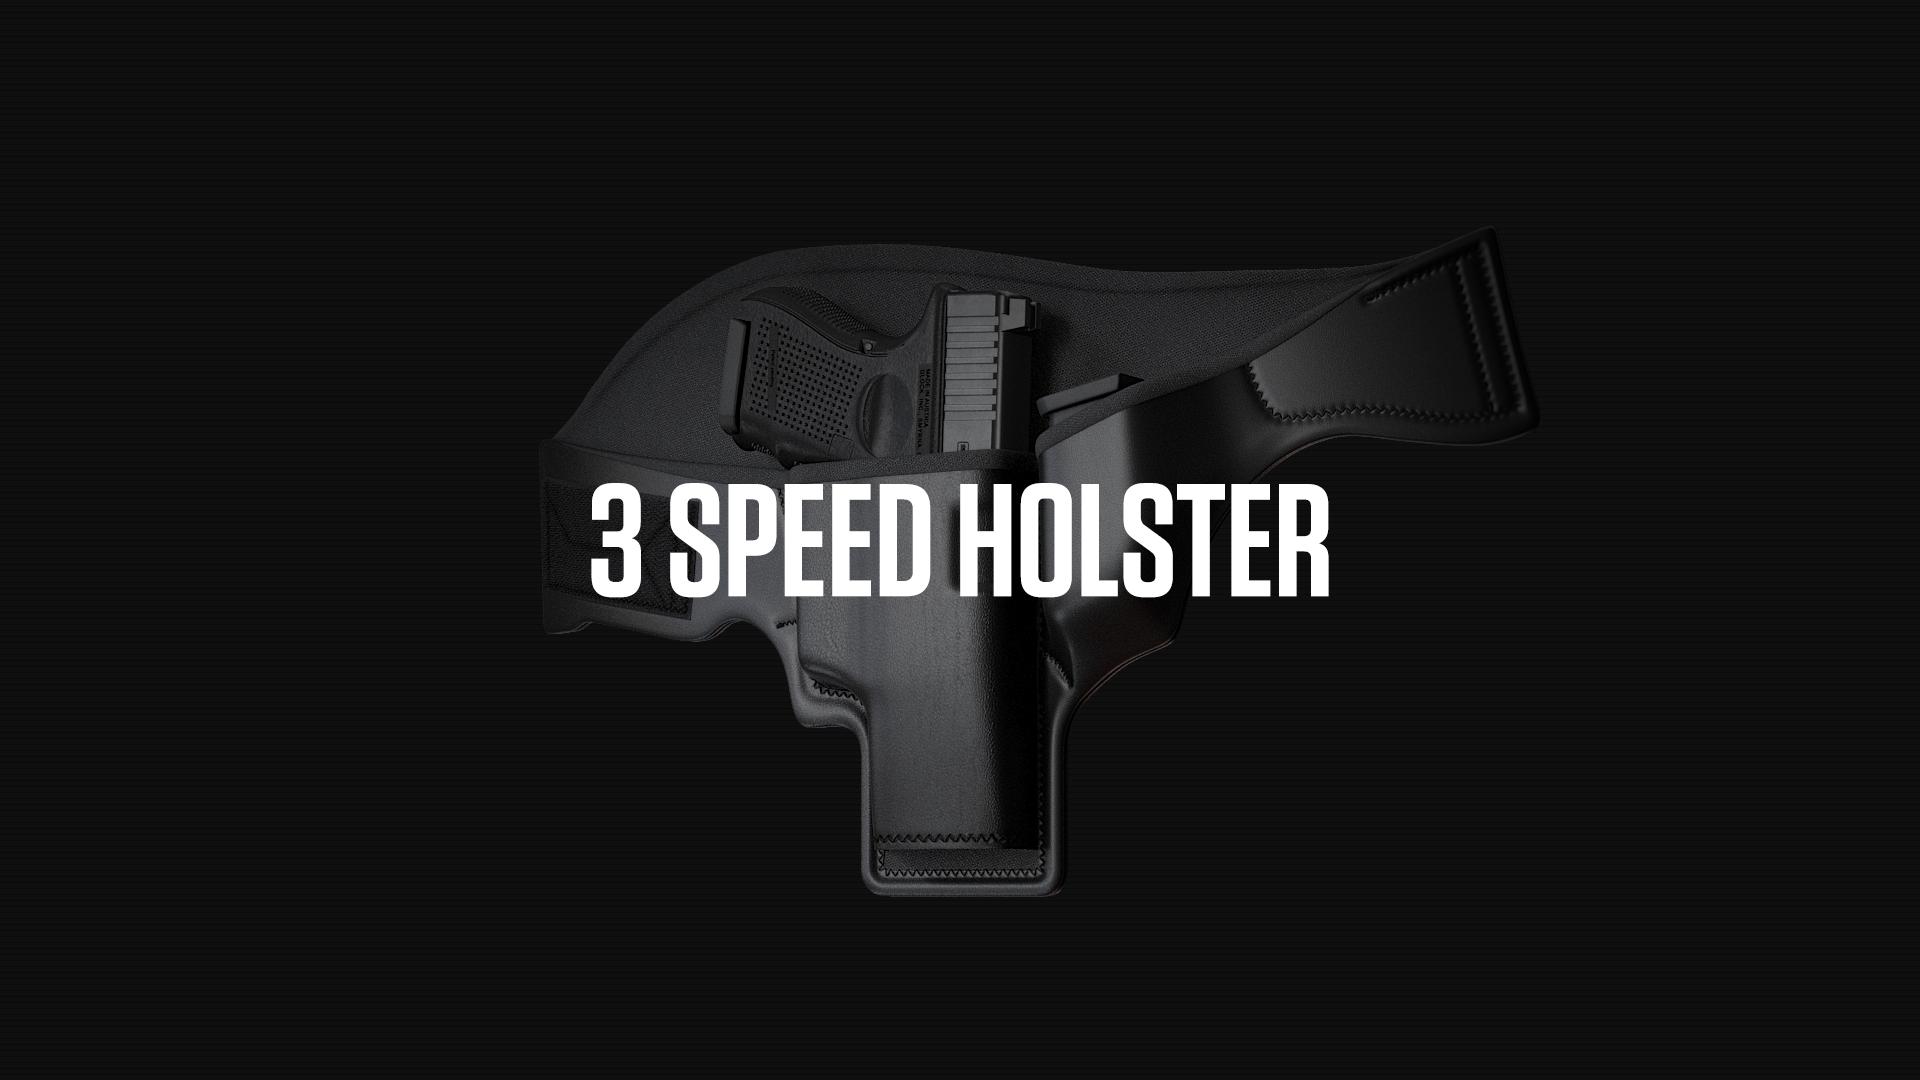 3 Speed Holster Website Design and Development